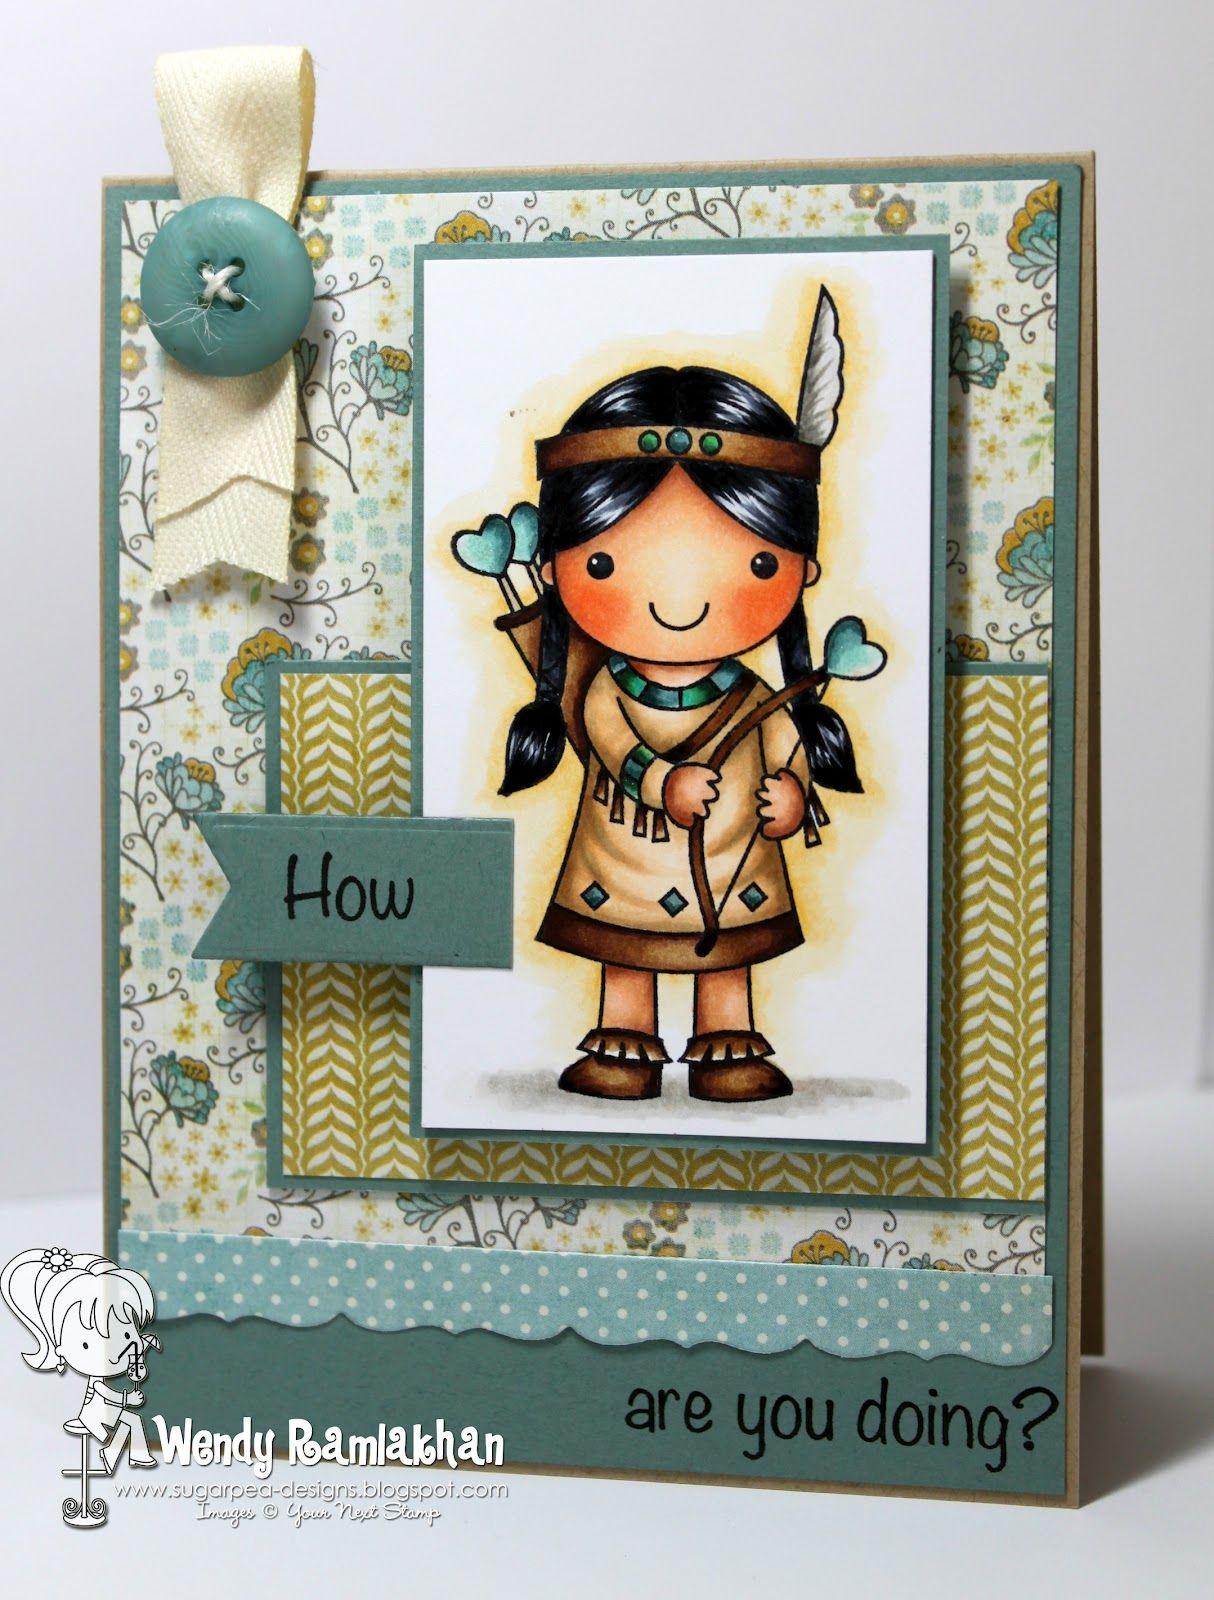 Wendy Ramlakhan of SugarPea Designs: YNS - Brooke & Nathan